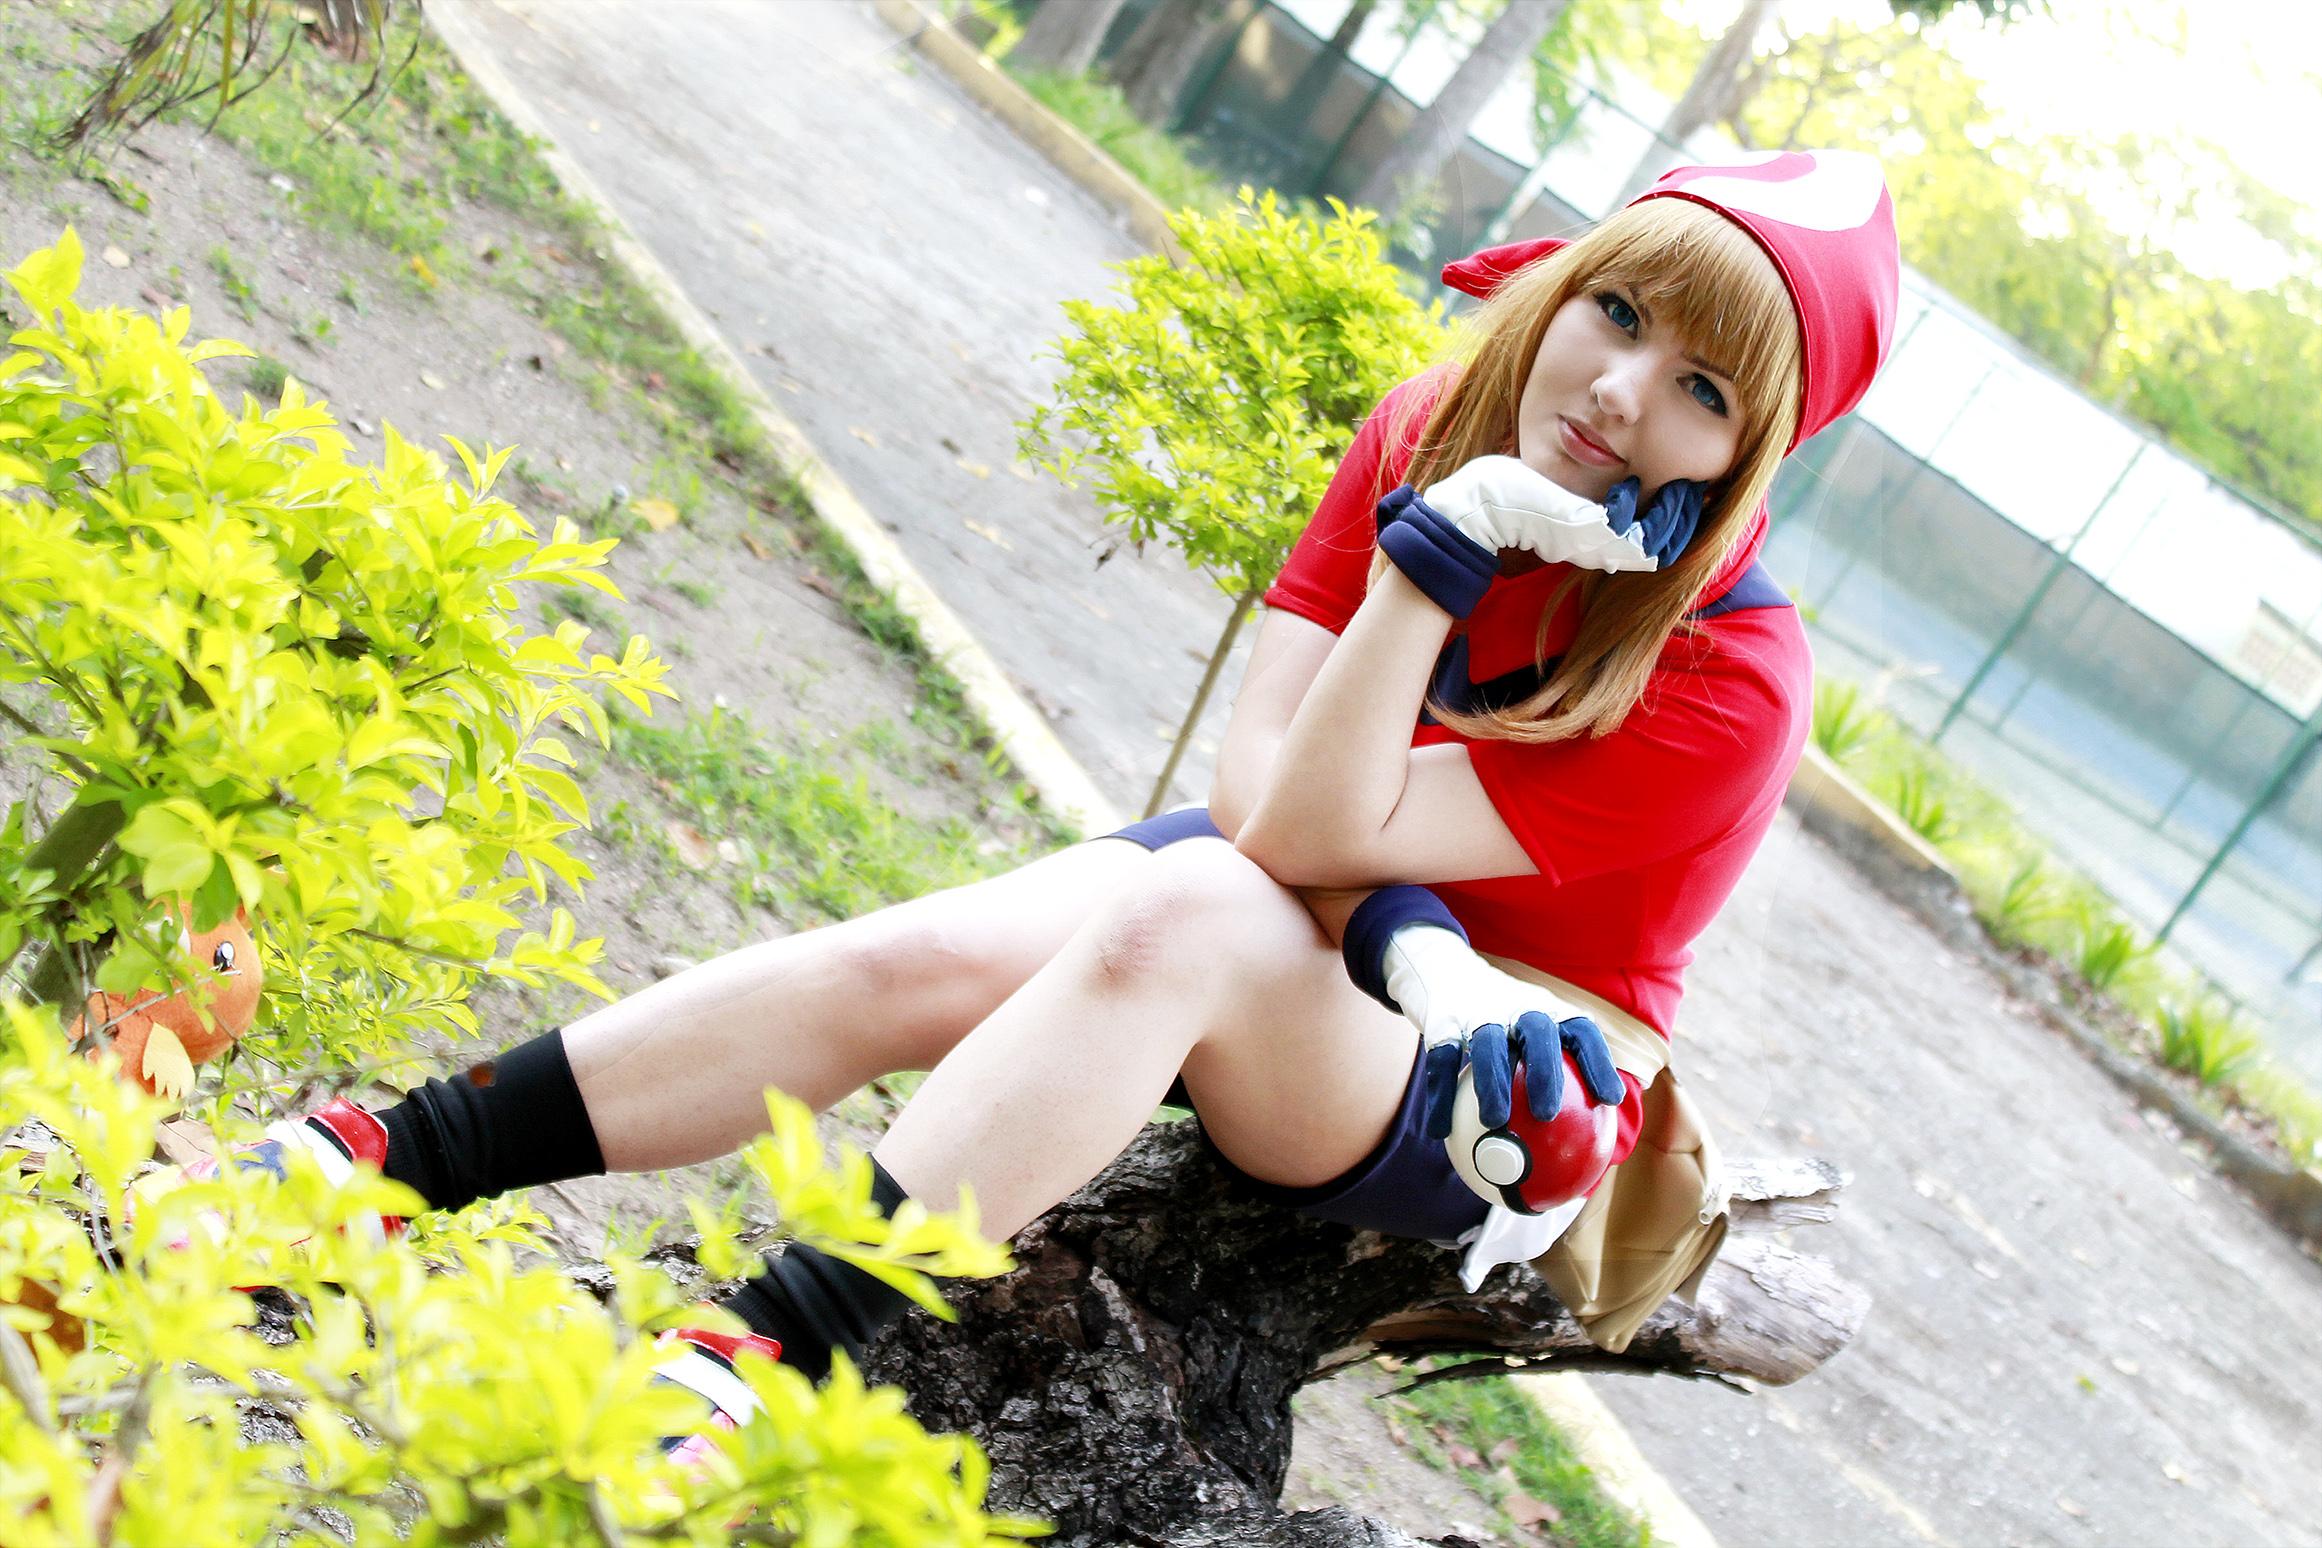 Le cosplay, le beau, le vrai  Sapphire_pokemon_by_dropchocolate-d7lc1kj